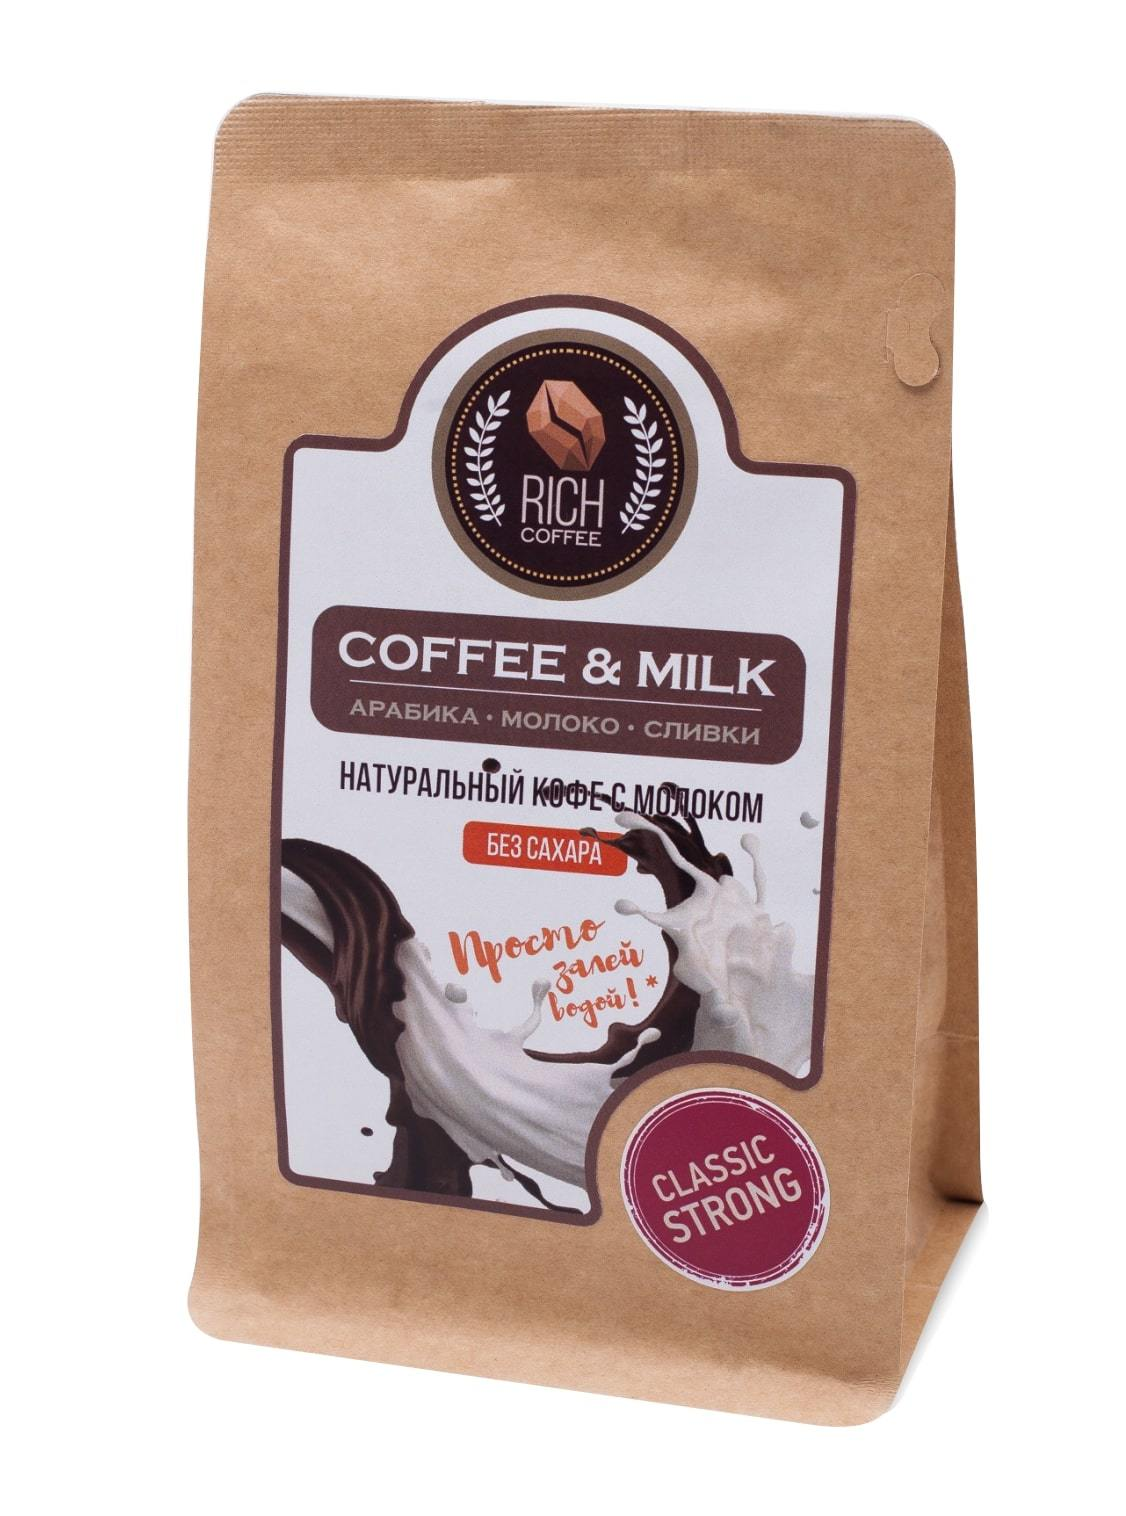 Натуральный молотый кофе Rich Coffee & Milk coffee / СТРОНГ, 200 г